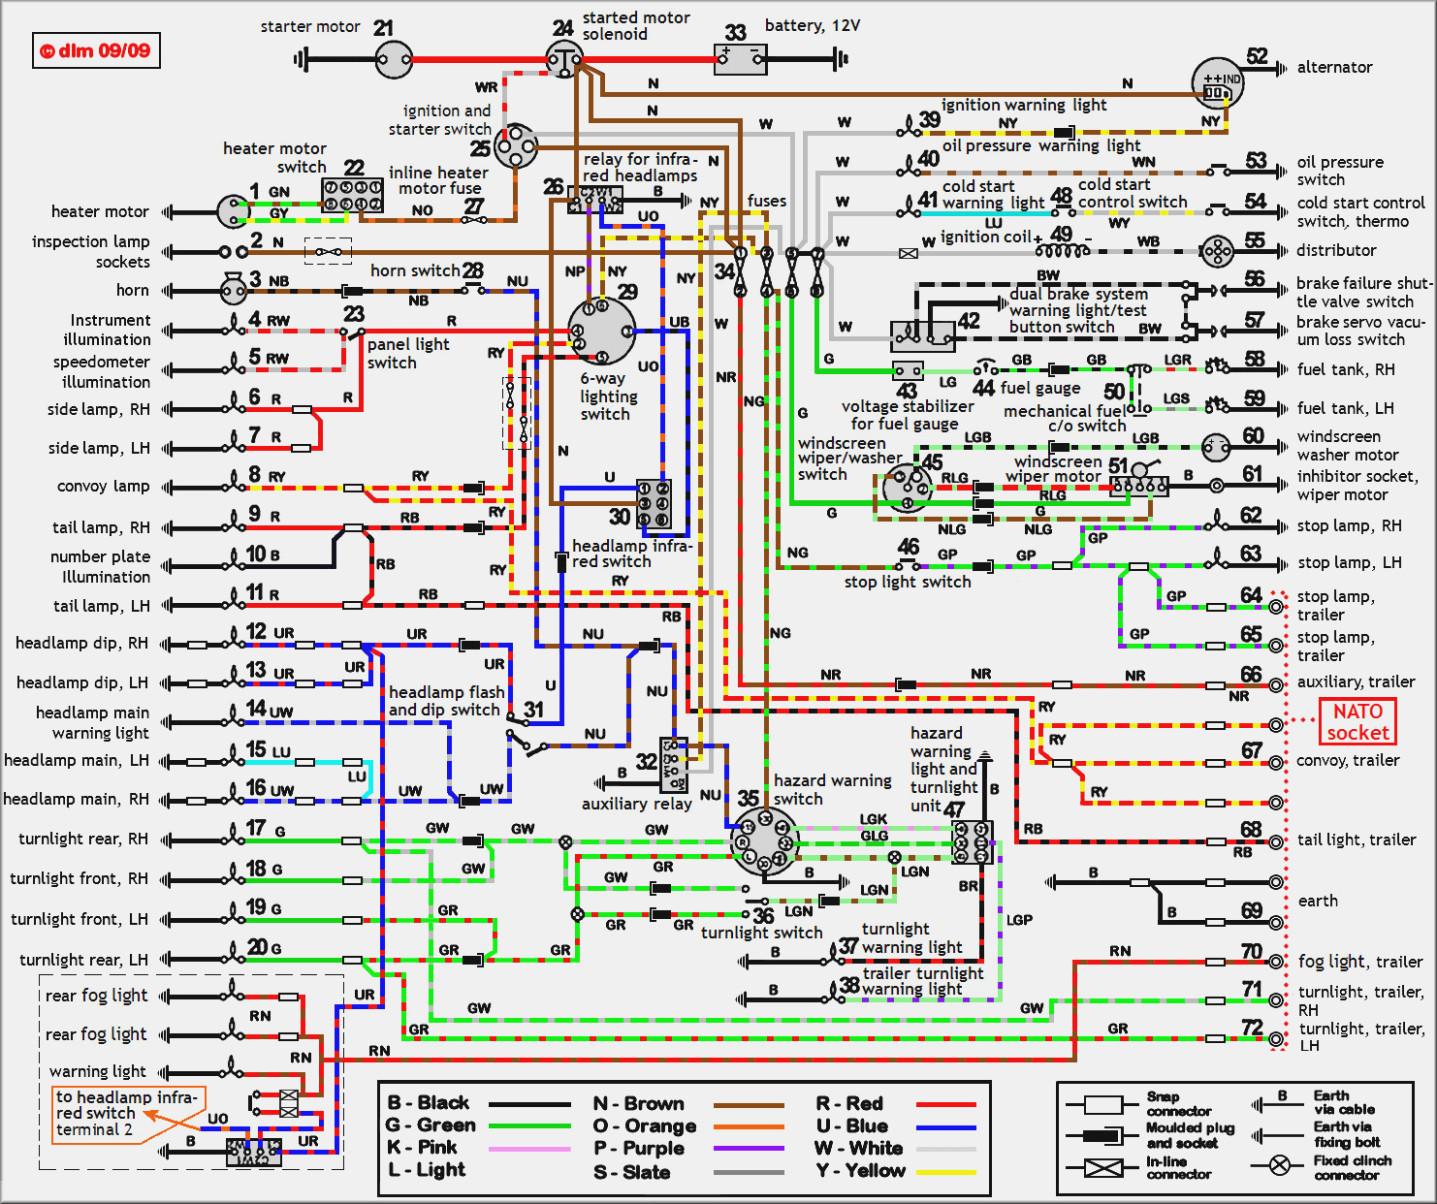 Fantastic Range Rover P38 Fuse Box Wiring Basic Electronics Wiring Diagram Wiring Cloud Onicaxeromohammedshrineorg